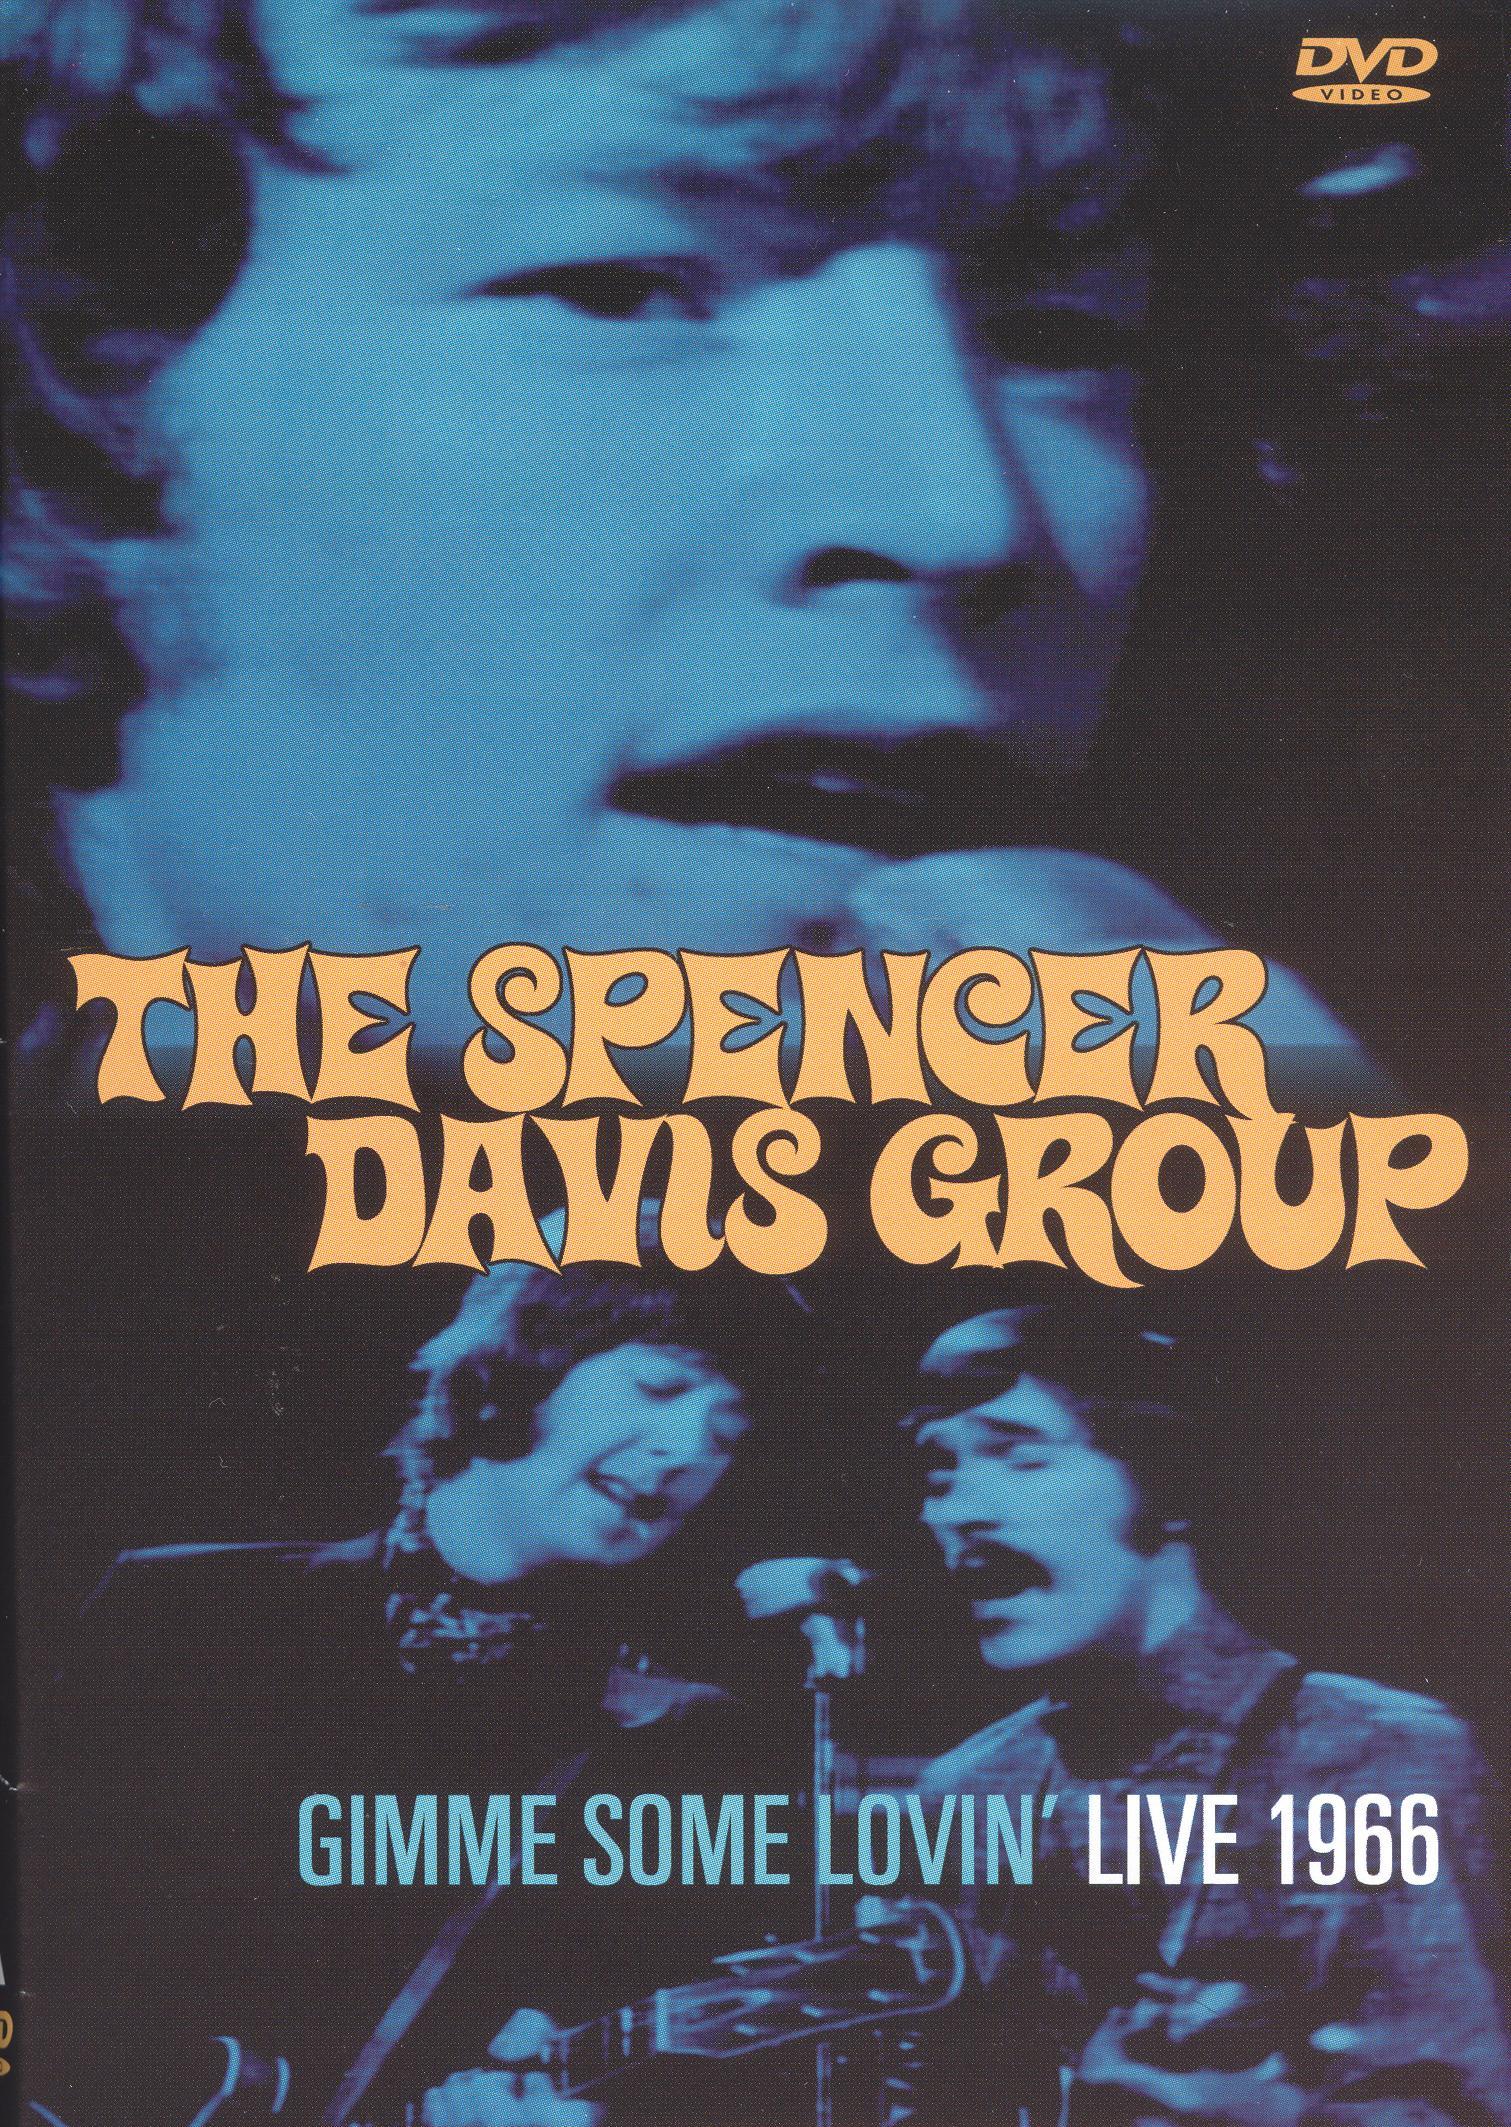 The Spencer Davis Group: Gimme Some Lovin' - Live 1966